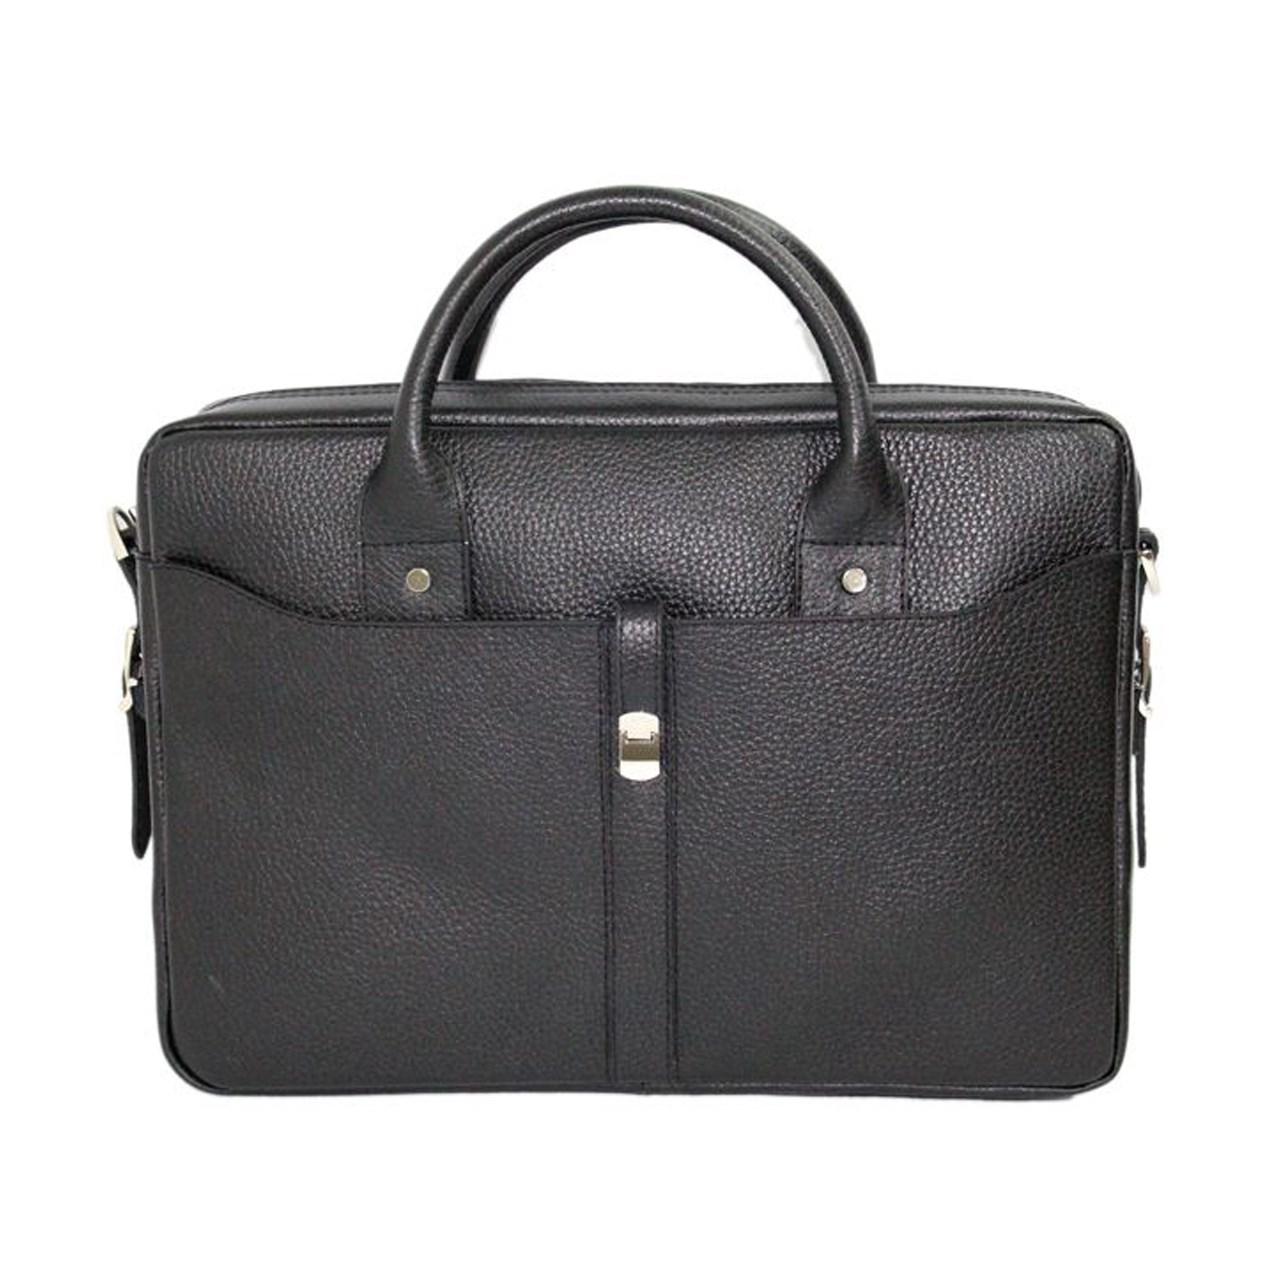 کیف اداری مردانه چرم آرا کد e022